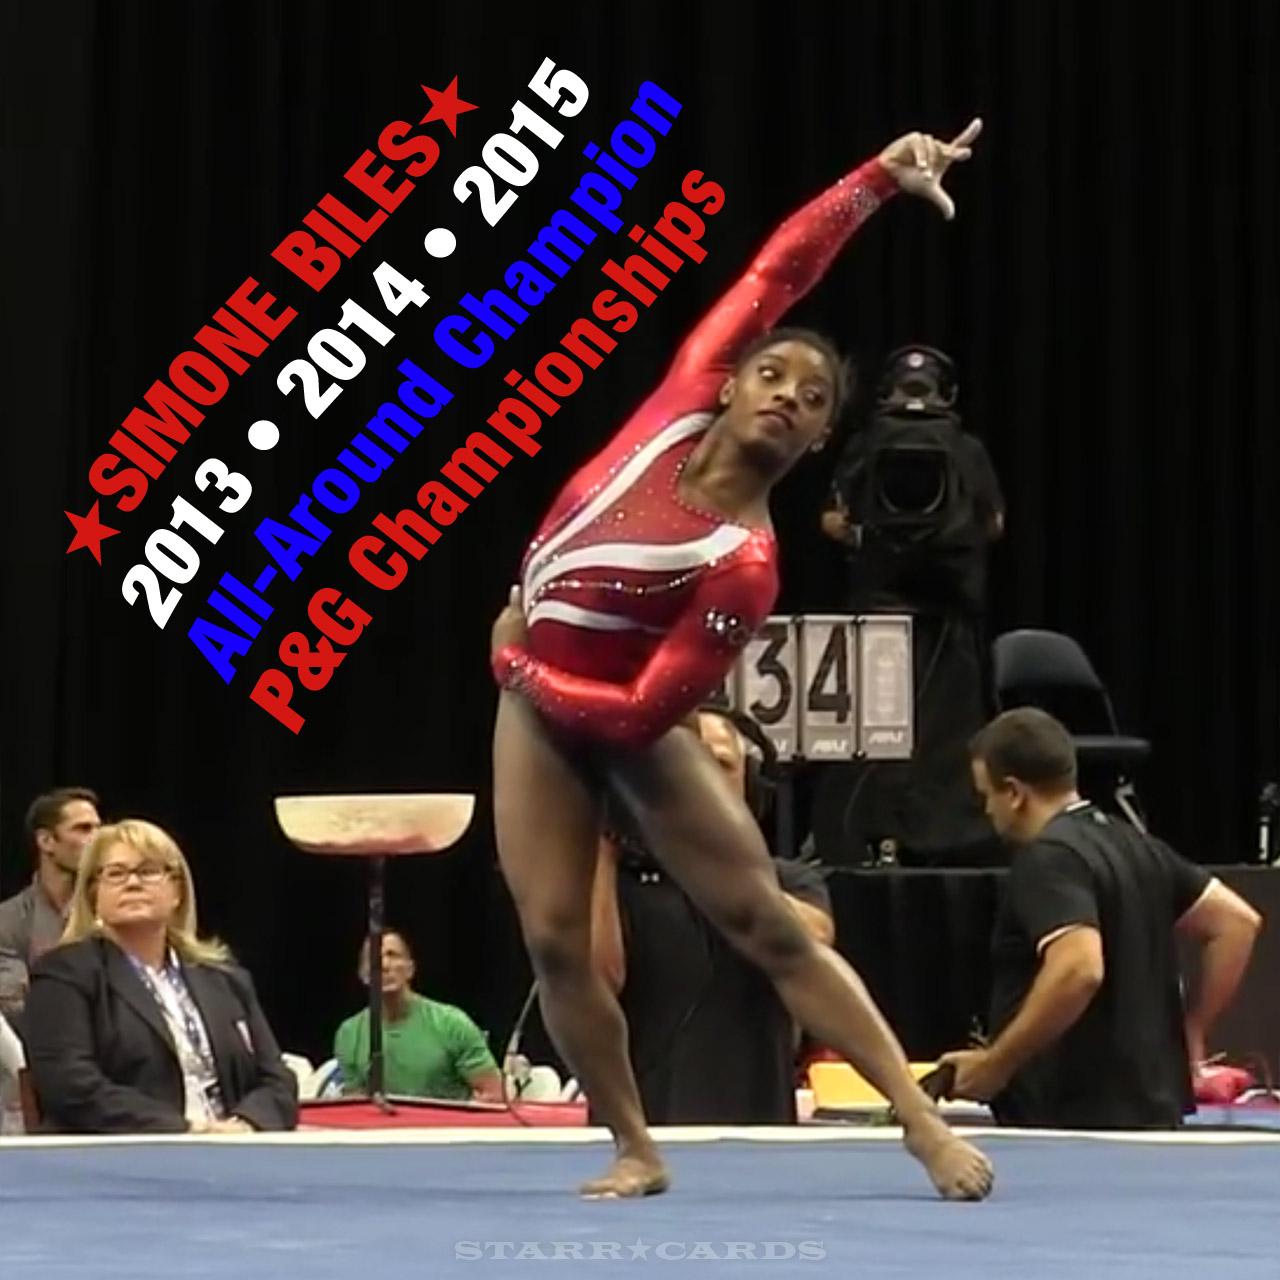 Gymnast Simone Biles three-peats as U.S. All-Around Champion